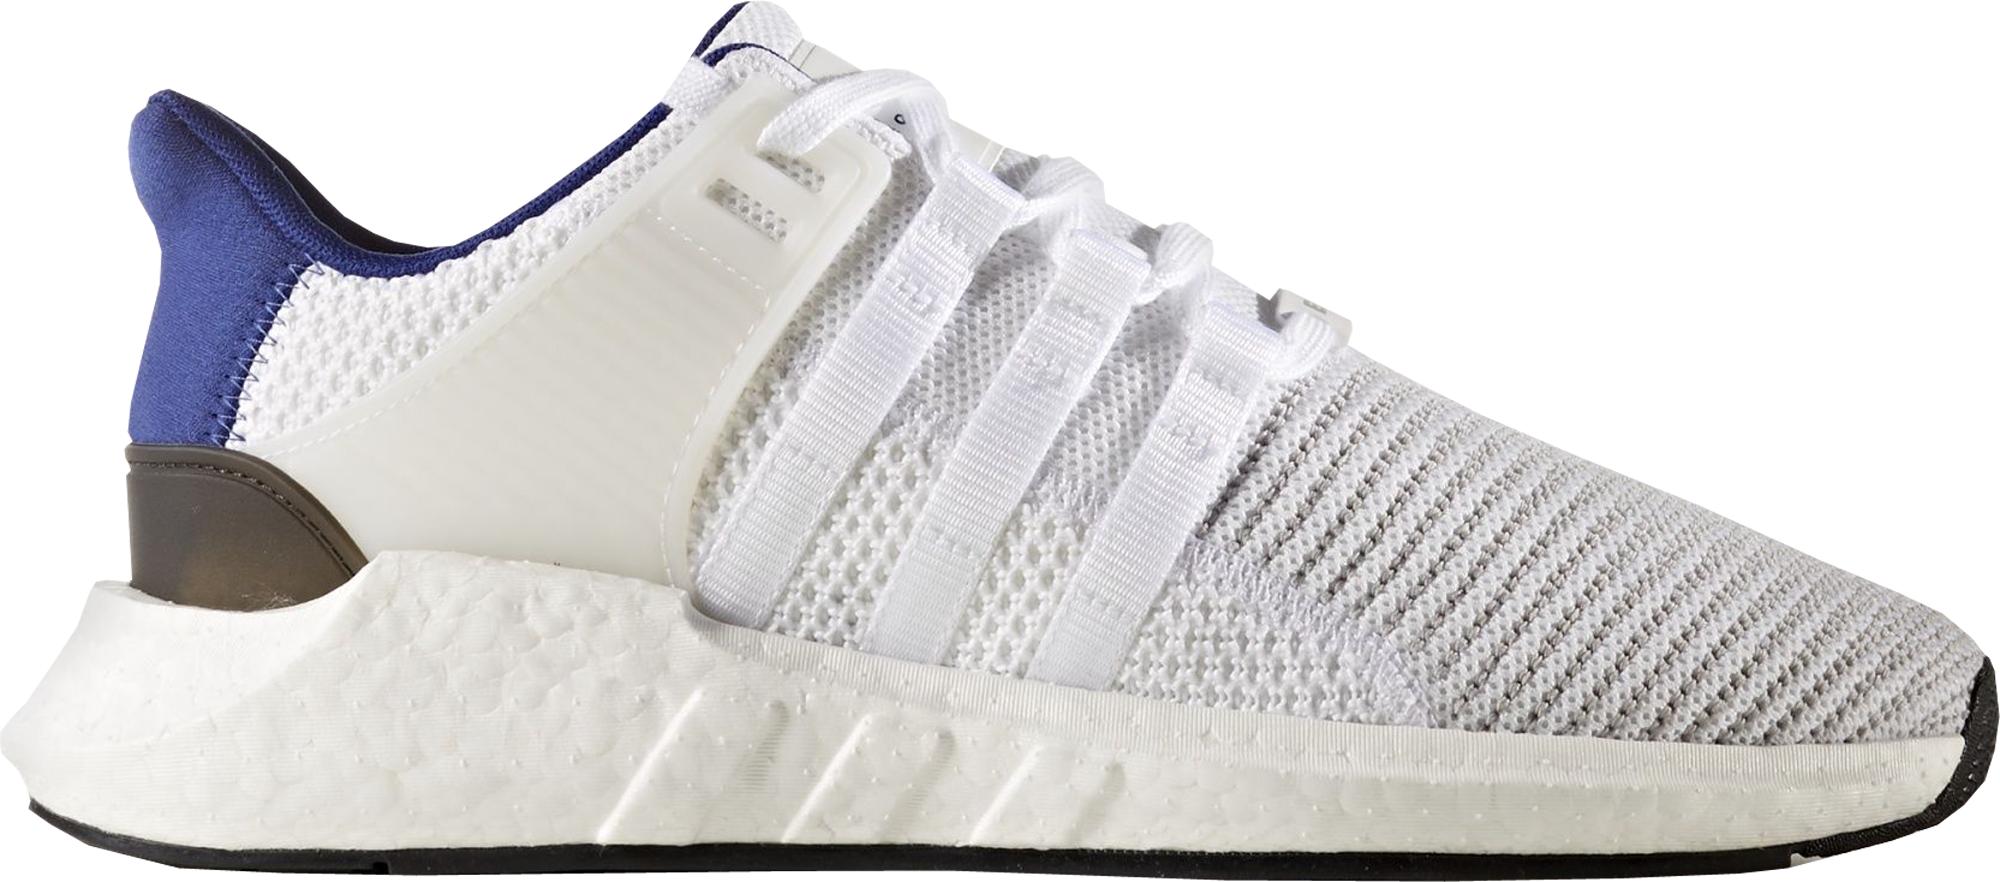 Adidas eqt bianco bz0592 reale sostegno 93 / 17